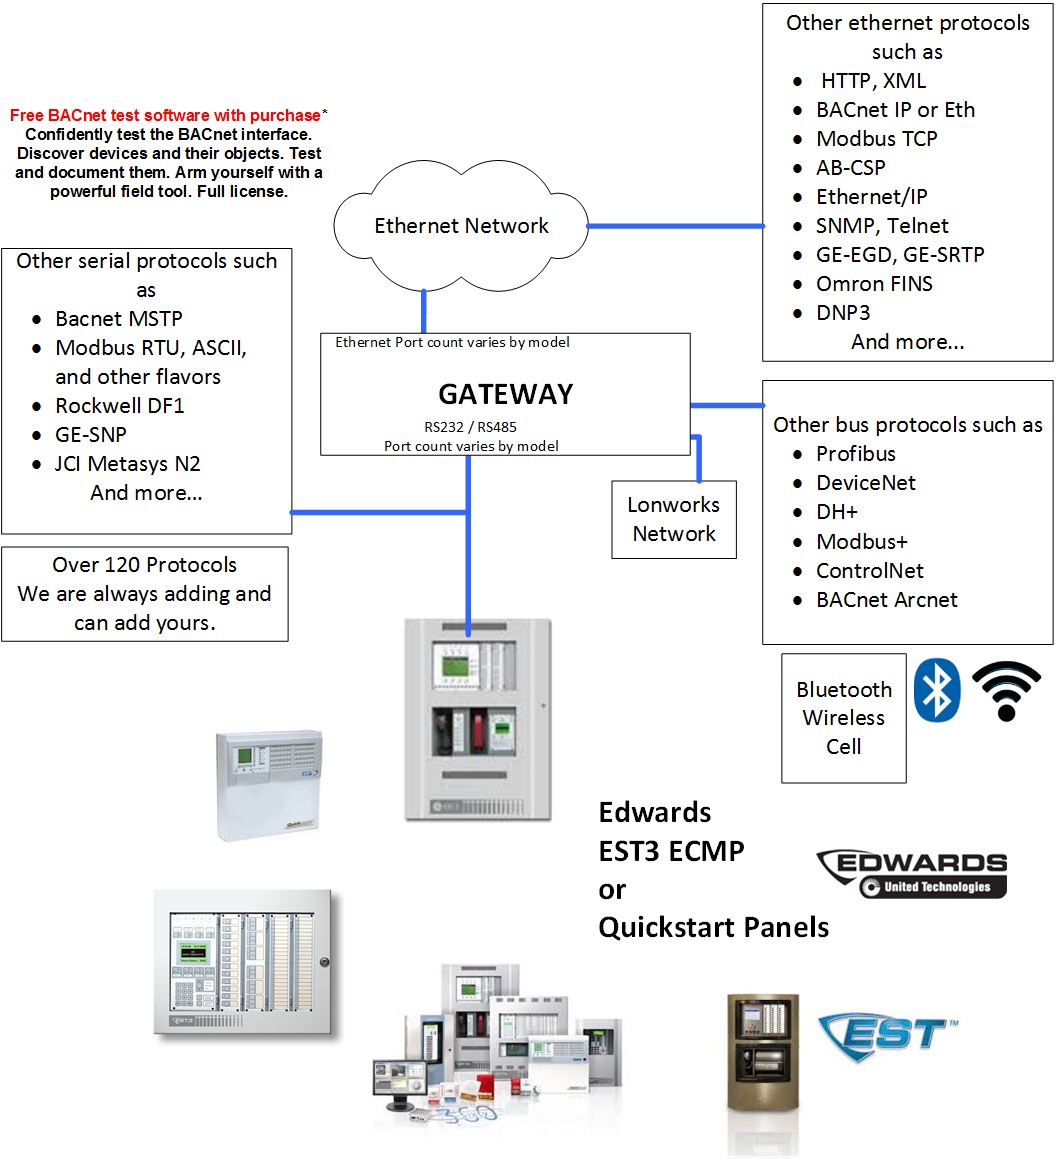 Est Quickstart Serial Cable Wiring Electrical Diagrams Modbus Rtu To Server